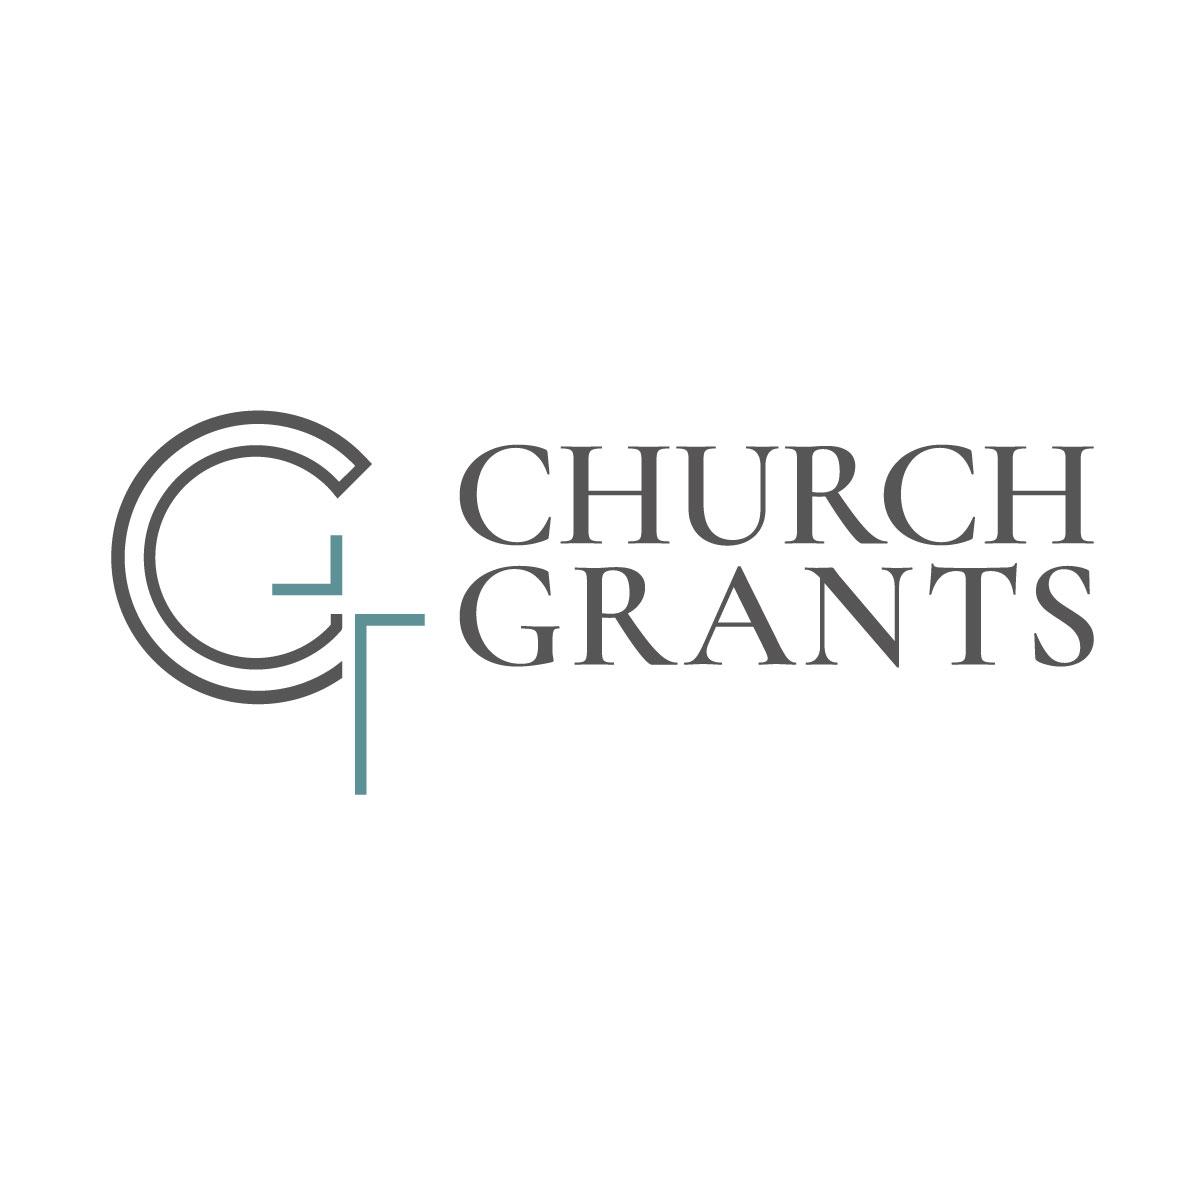 Church Grants Logo Design - C G and cross